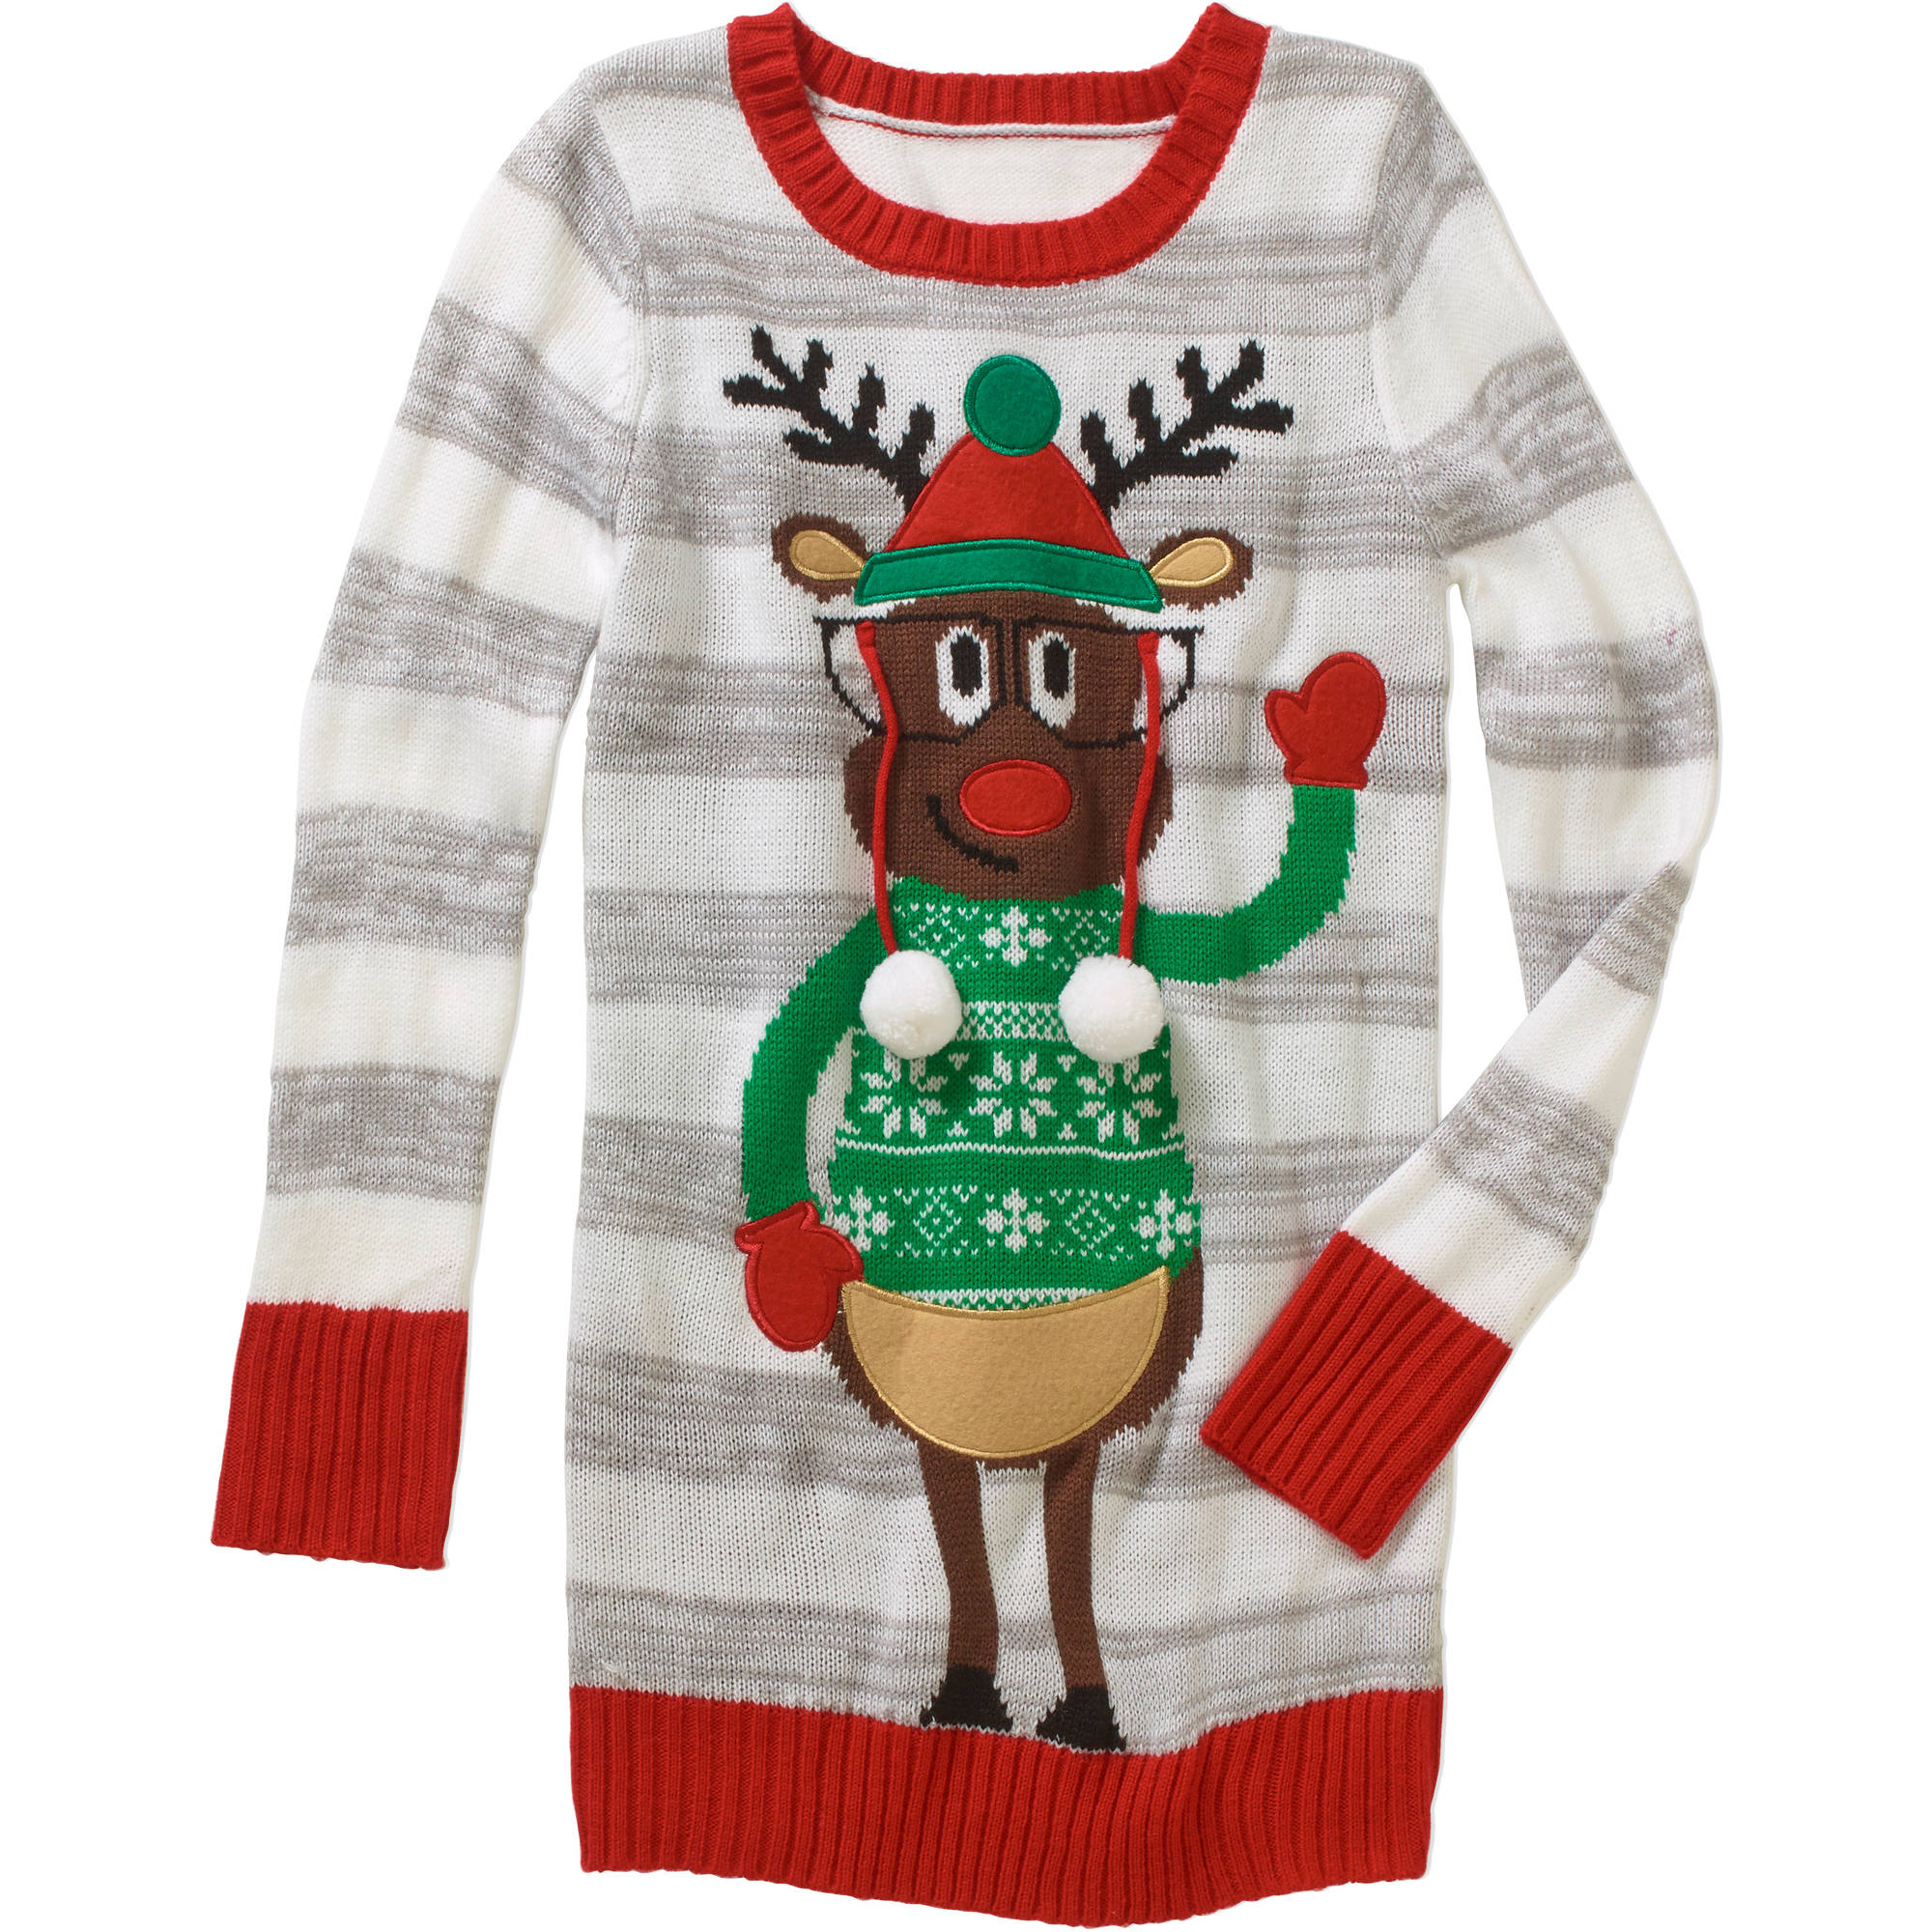 Derek Heart Girls' Reindeer Tunic Sweater with Pom-Poms